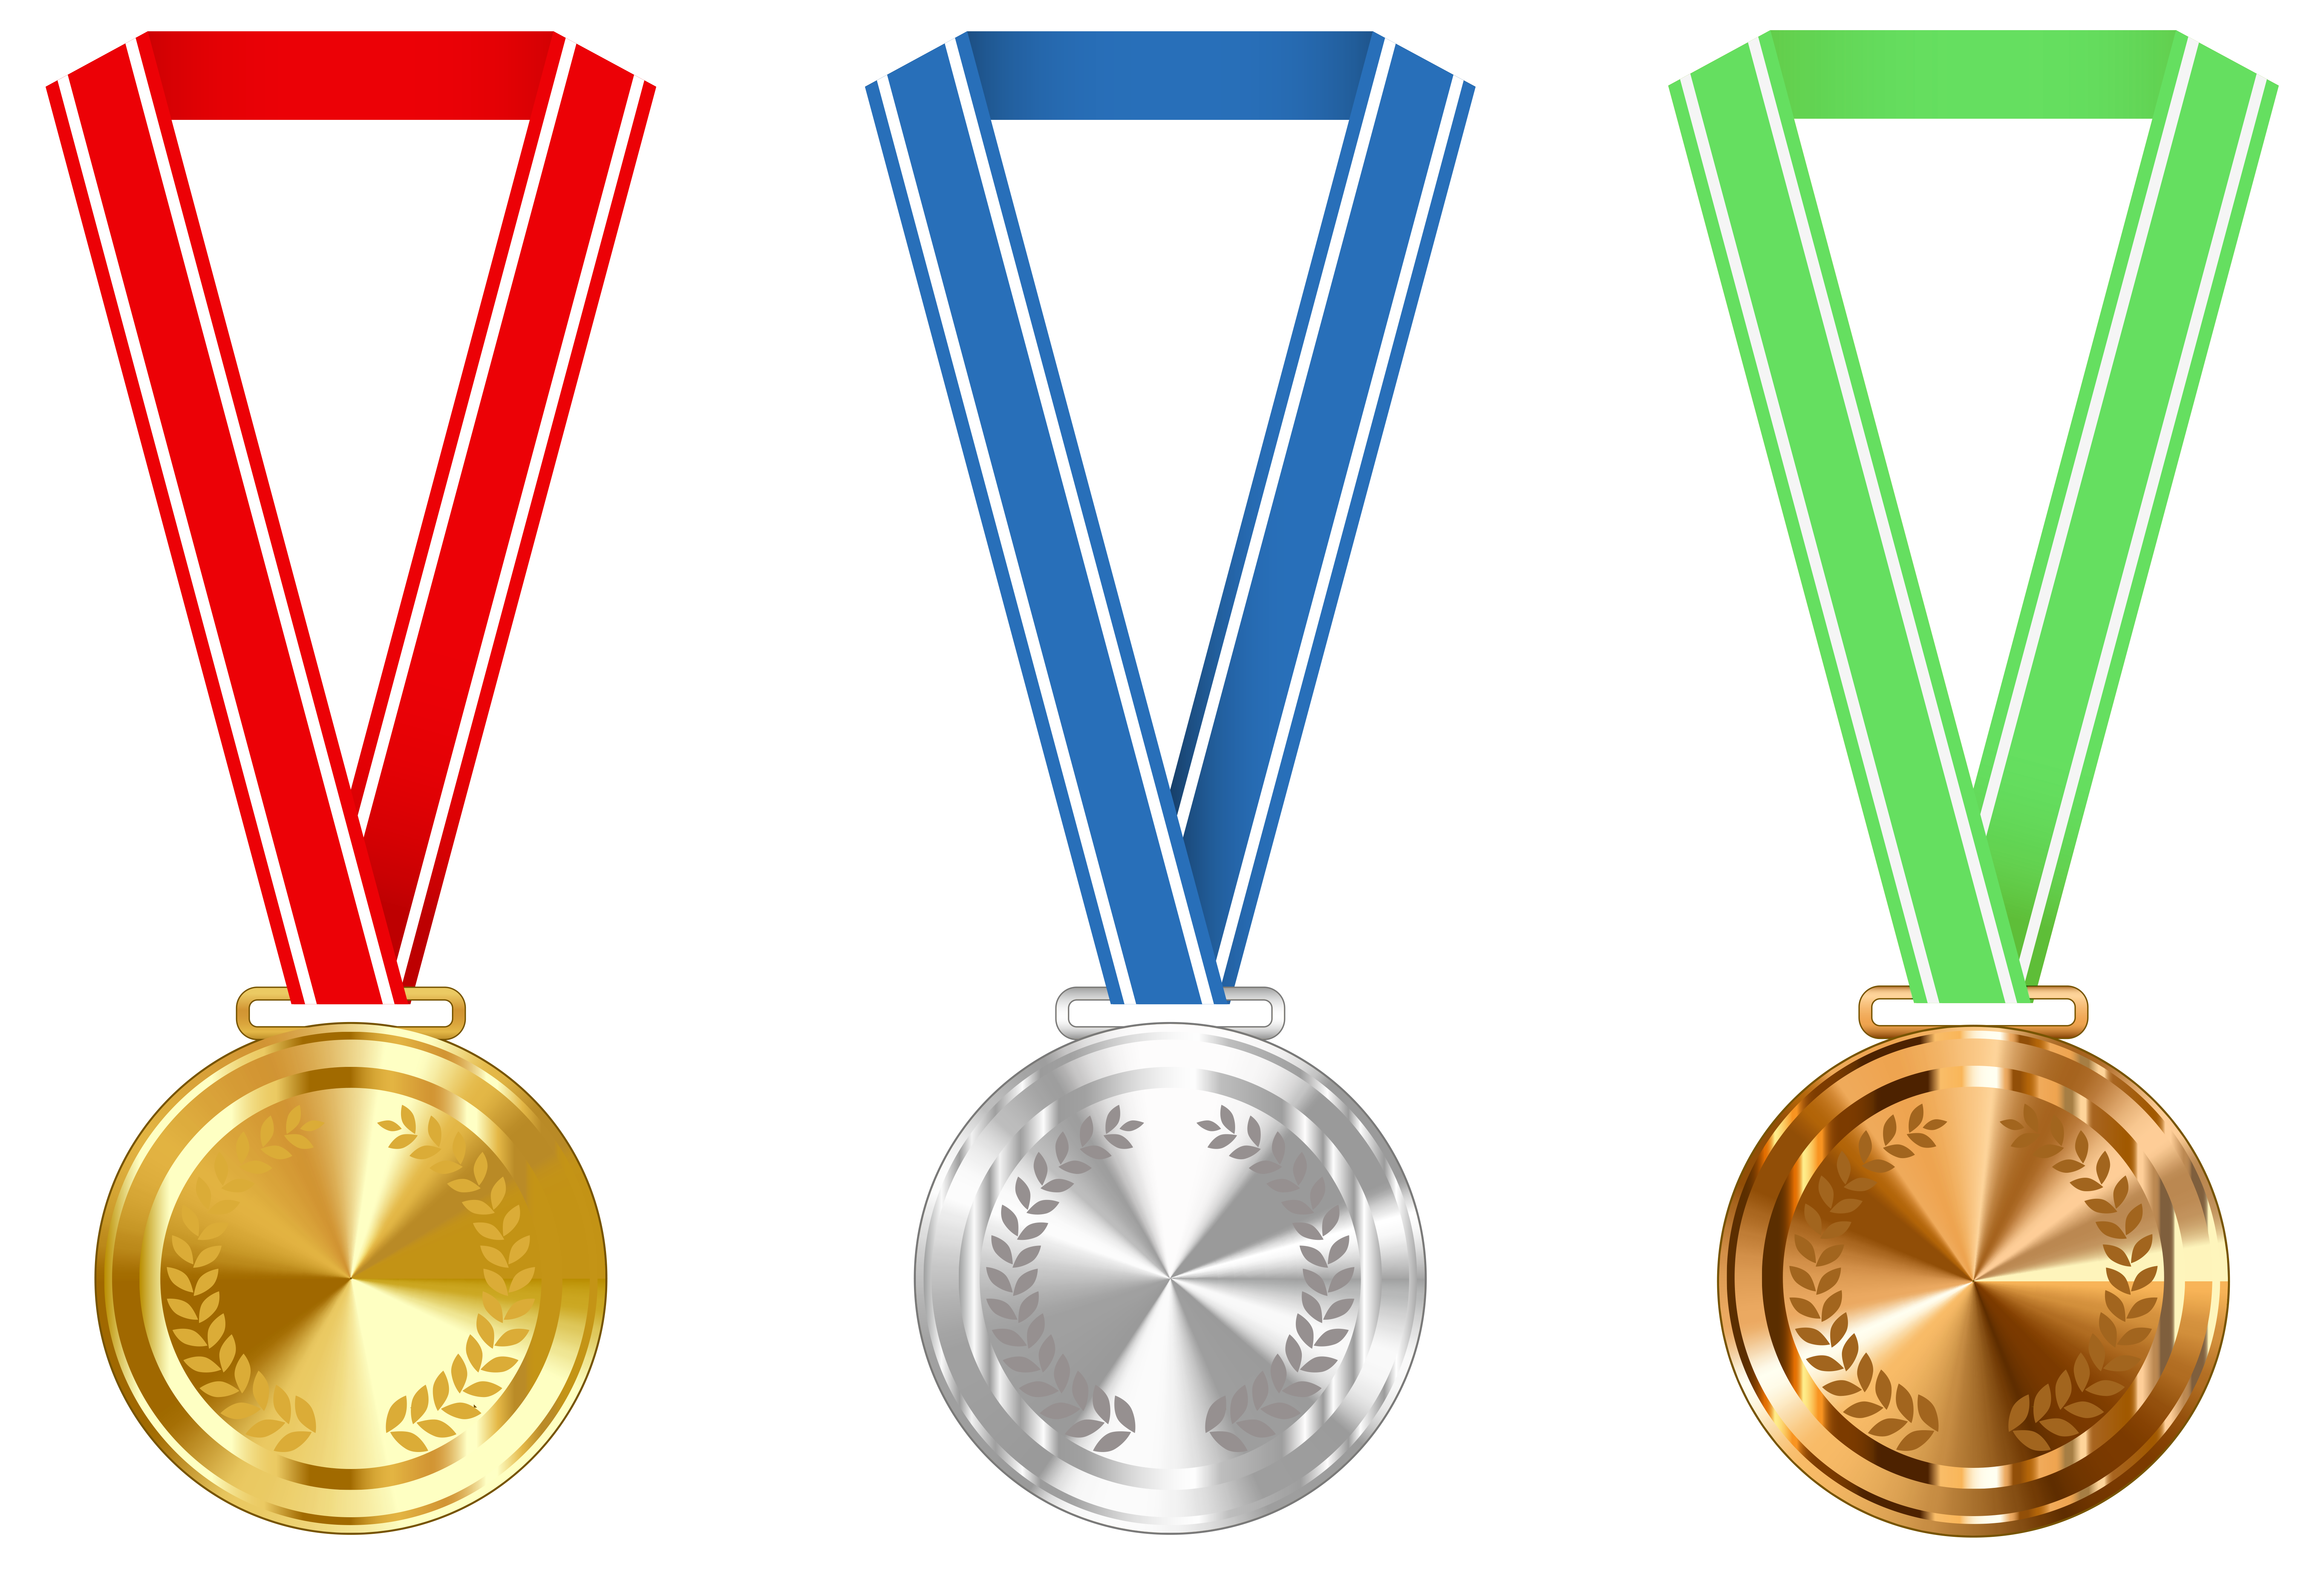 Bronze medal Gold medal Silver medal Clip art.